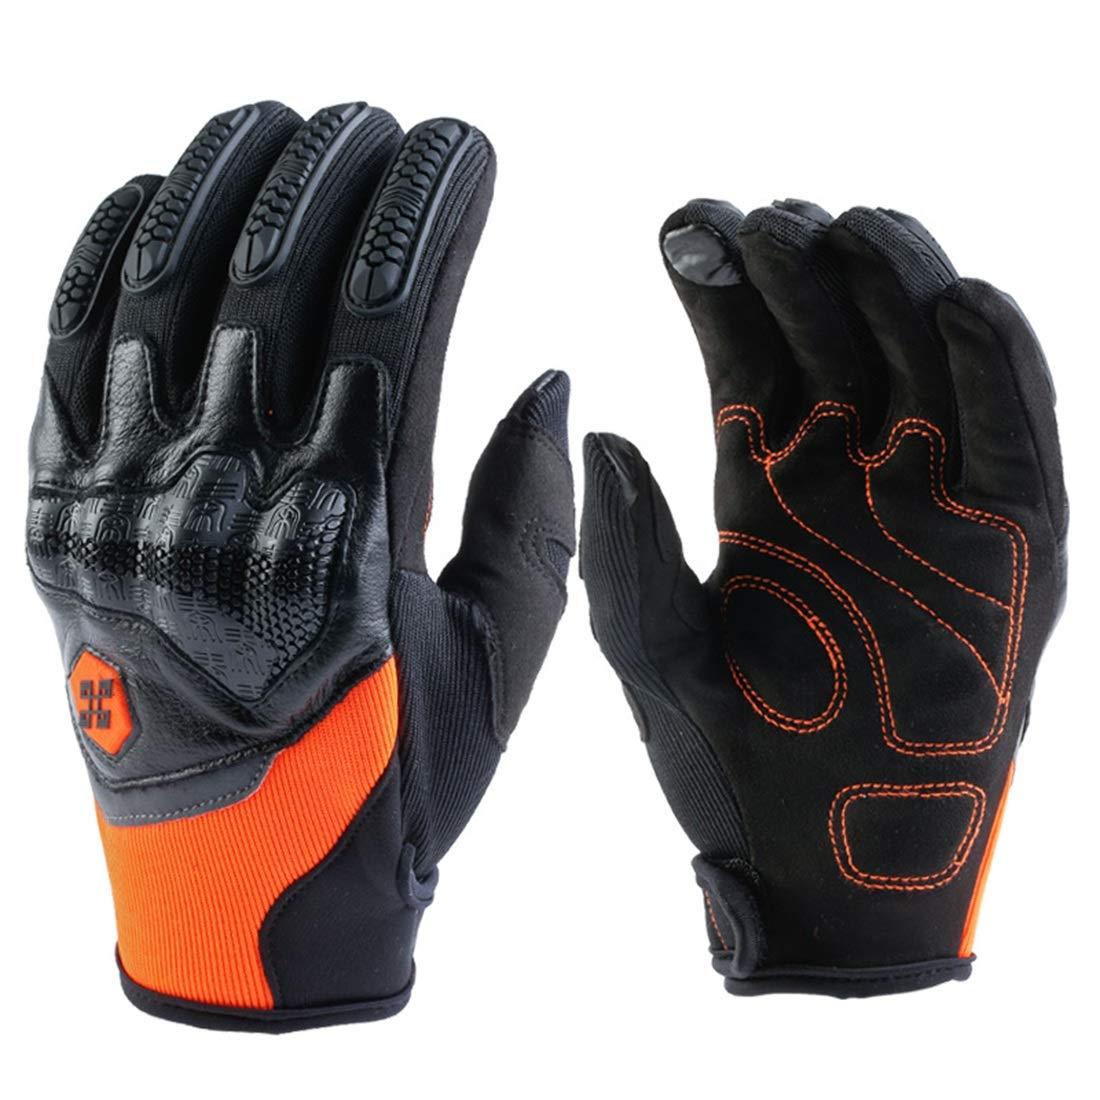 JESSIEKERVIN YY3 Touchscreen Vollfinger-Fahrradhandschuhe für das Motorradklettern Wandern Jagd Outdoor Sports Gear Handschuhe